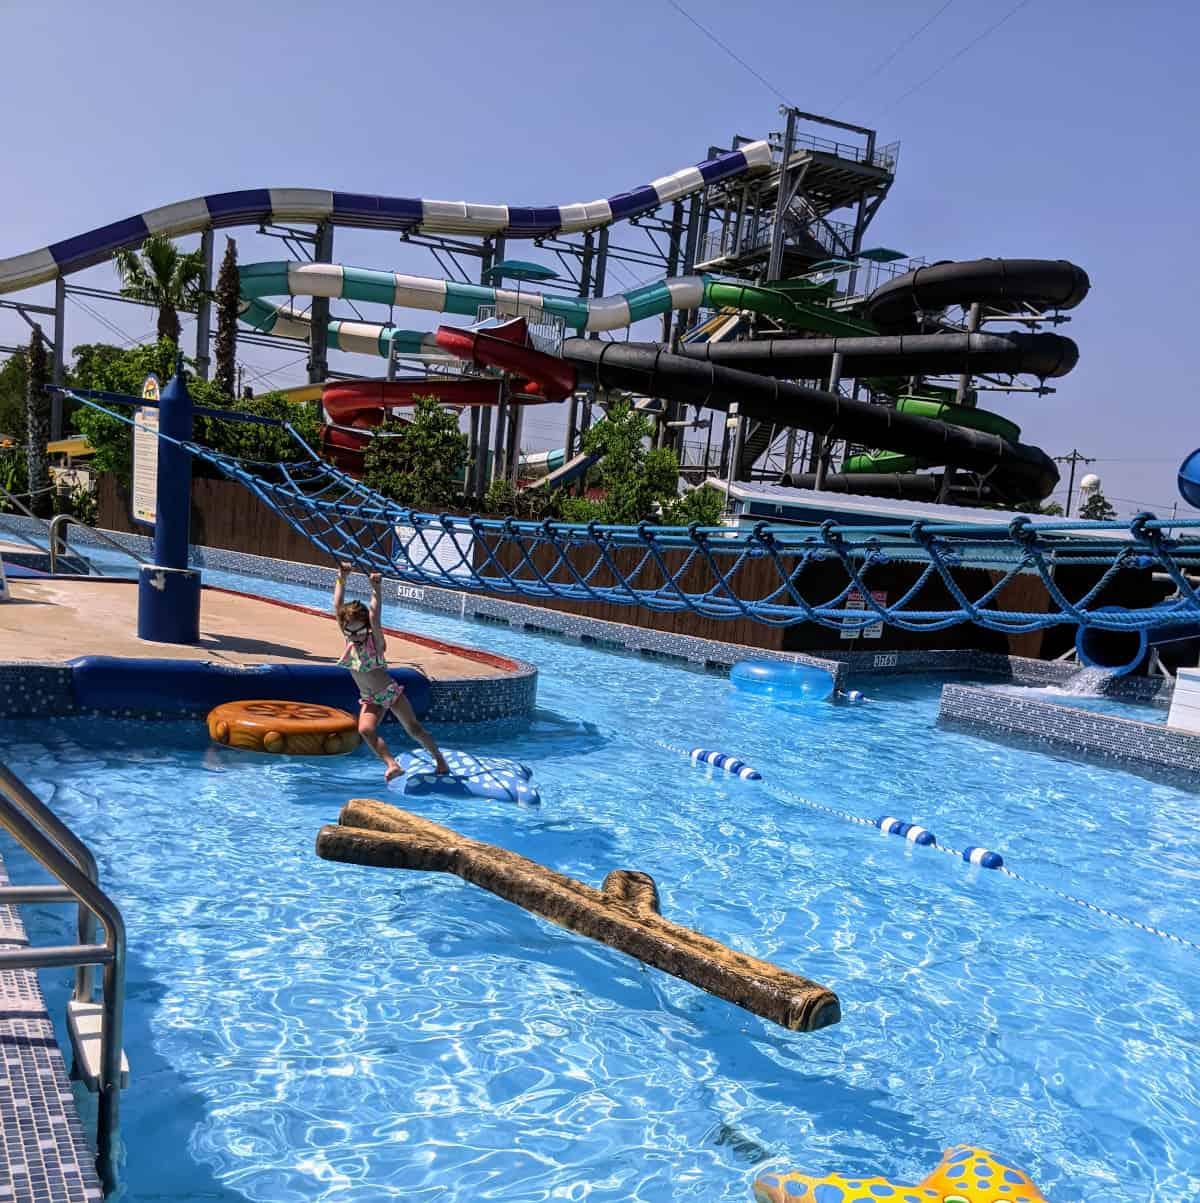 Splashway Waterpark Monkey Bars and Slides